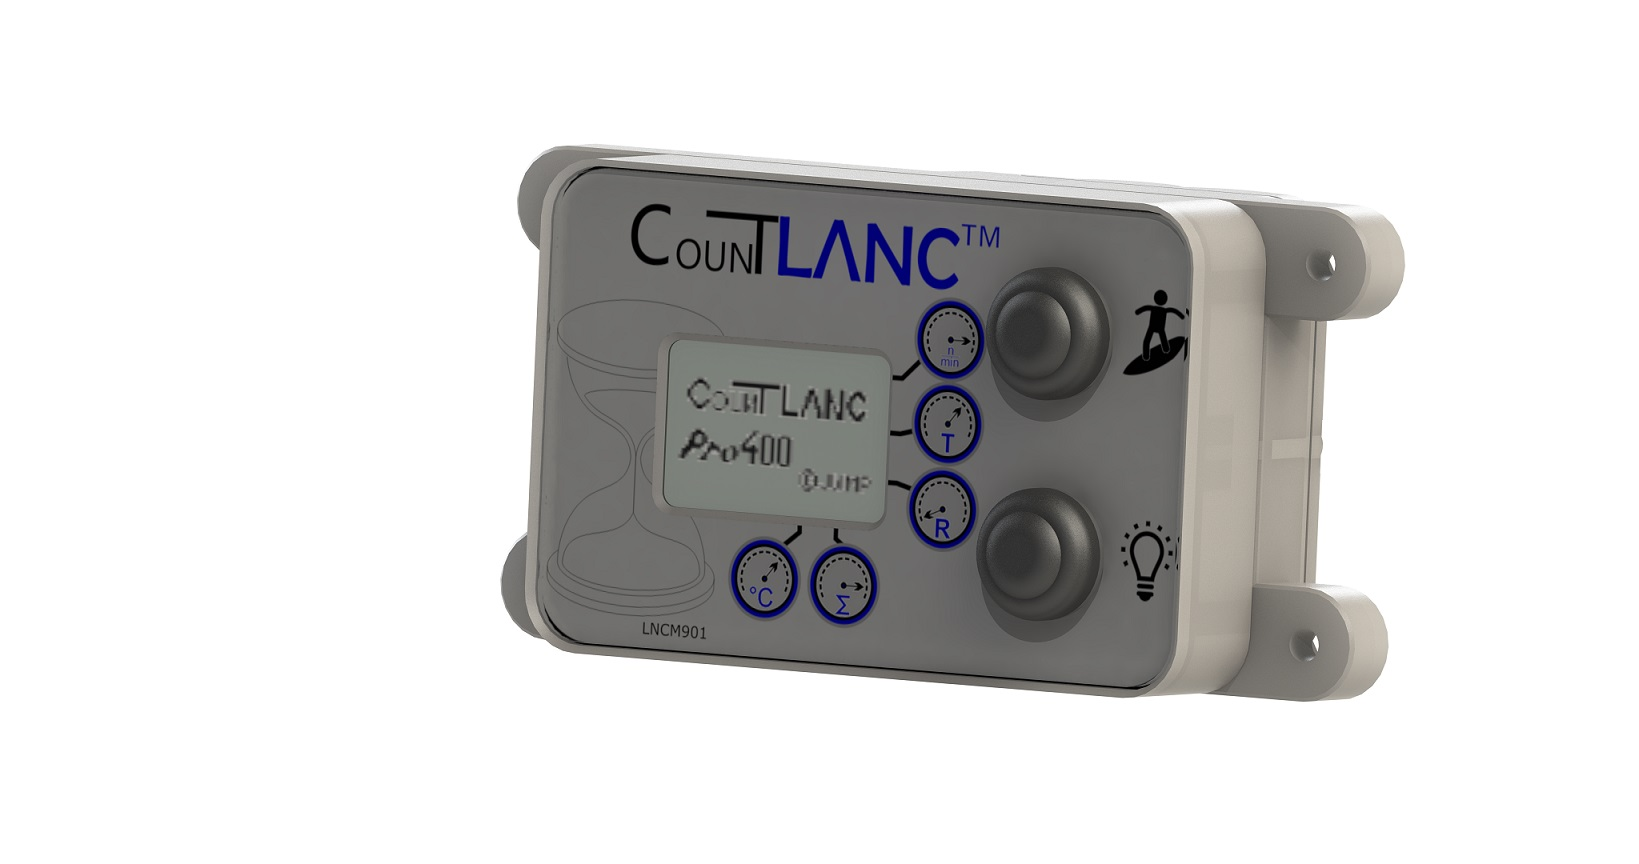 CountLANC-Pro400-G